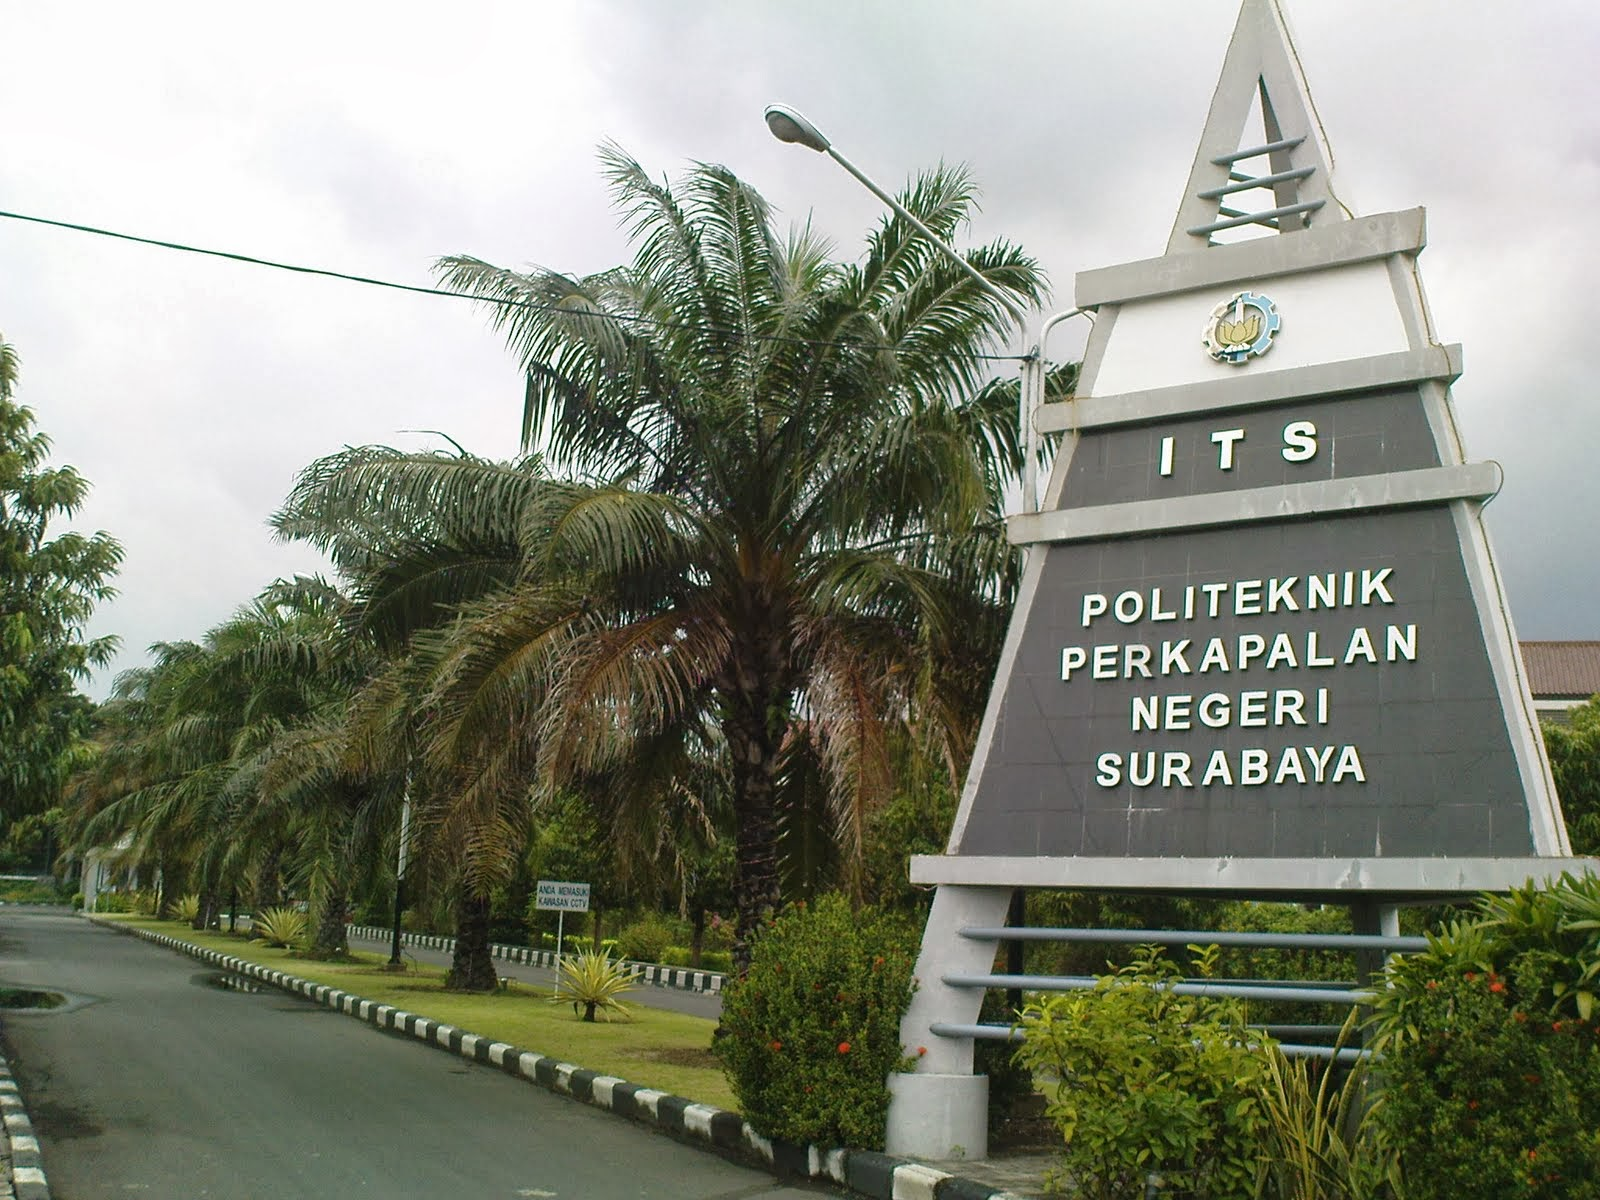 Pendaftaran Politeknik Perkapalan Negeri Surabaya (PPNS) 2017-2018